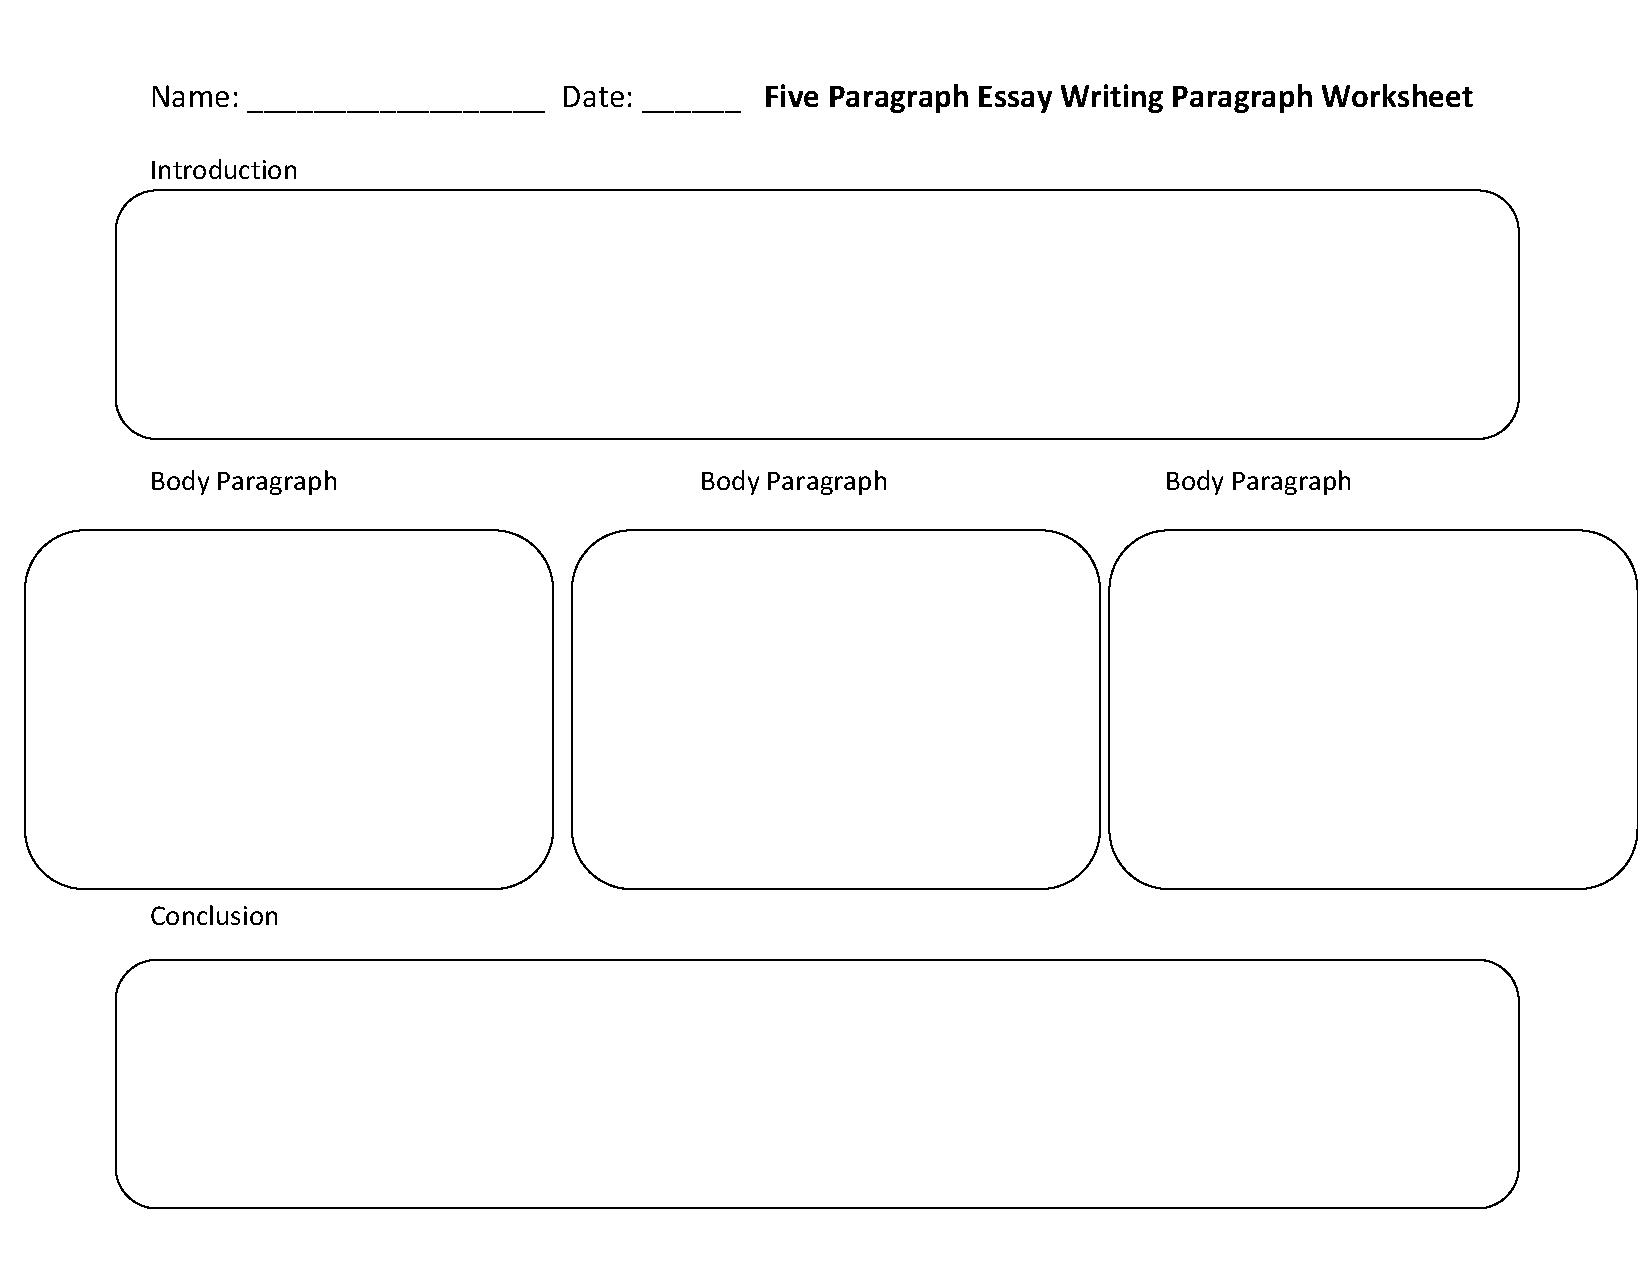 Writing Worksheets | Paragraph Writing Worksheets | Free Printable Paragraph Writing Worksheets